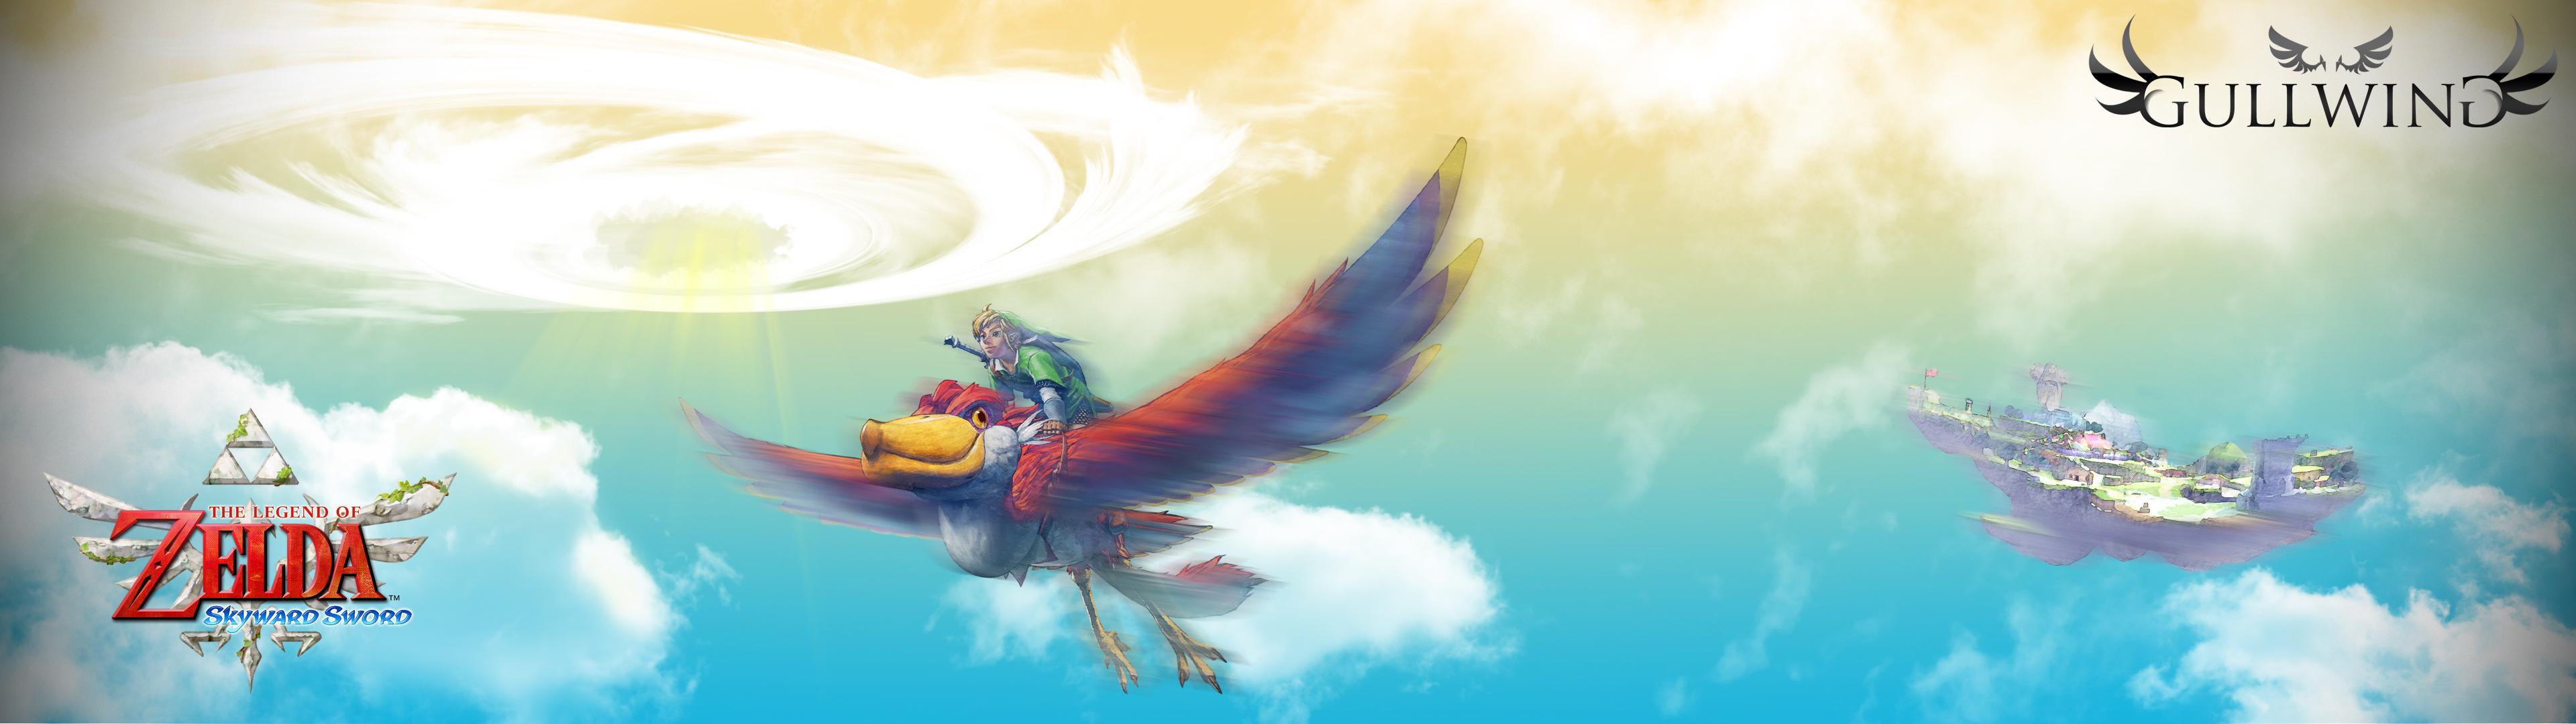 Legend Of Zelda Skyward Sword By Gullwingxtreme On Deviantart